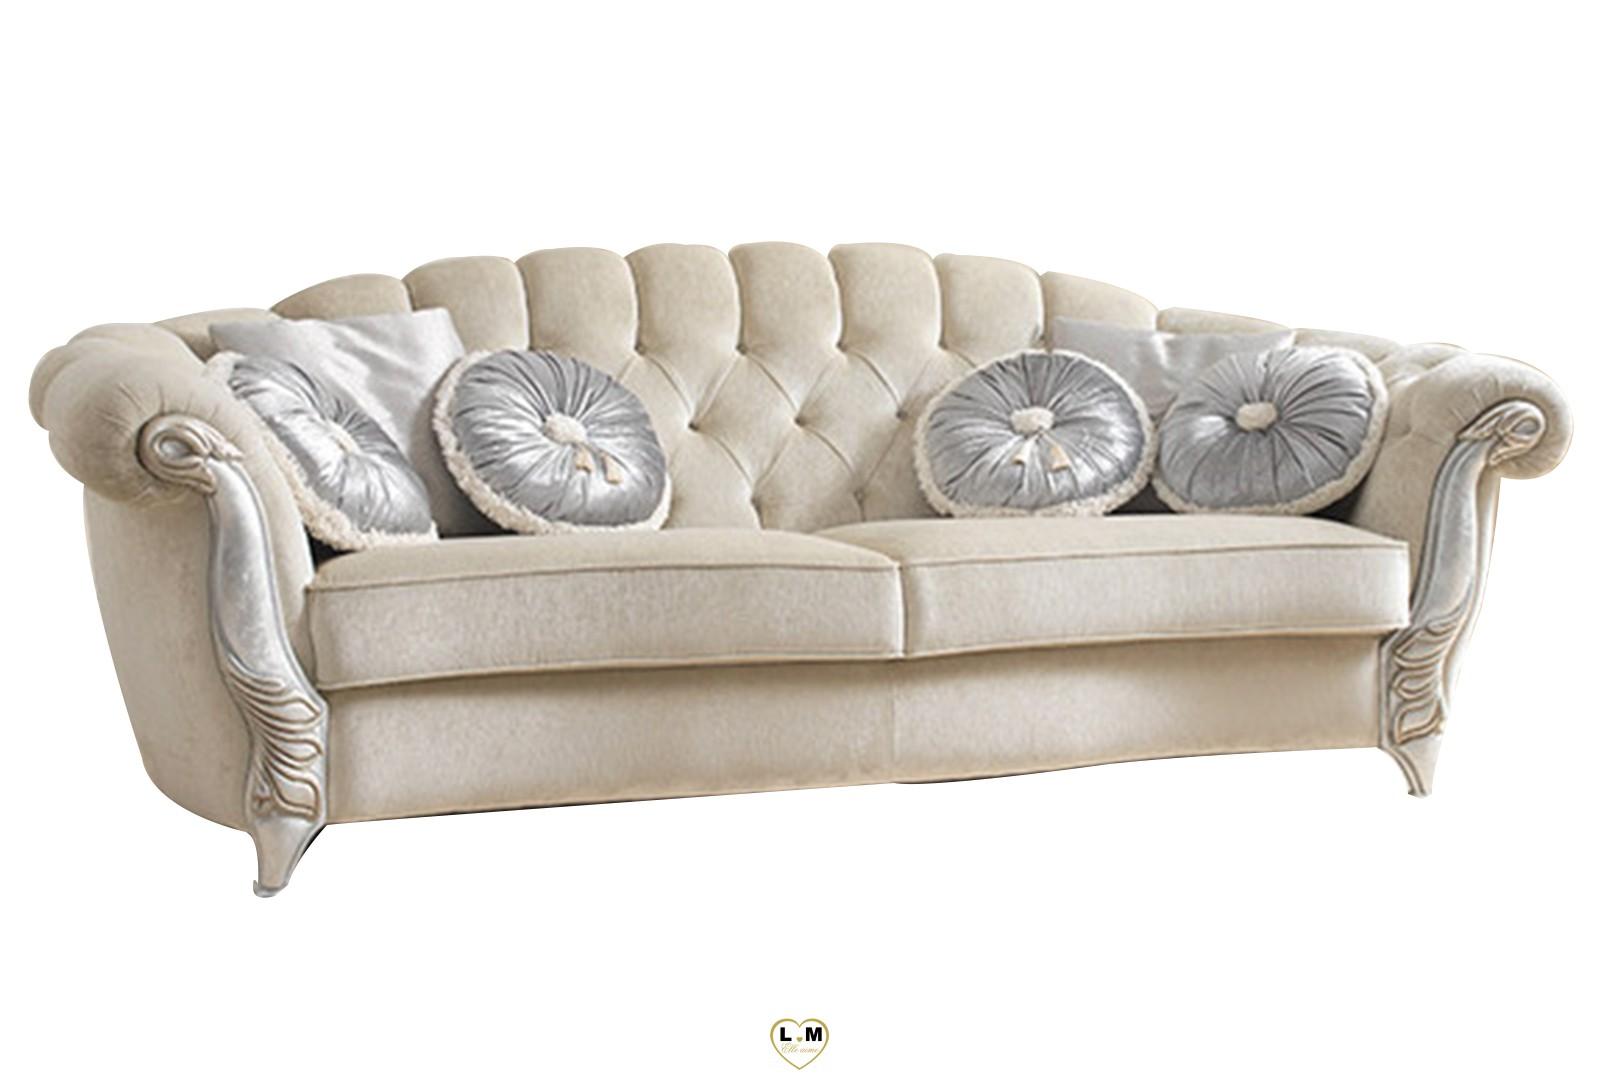 Gilda salon tissus ivoire lignemeuble com for Gildas salon